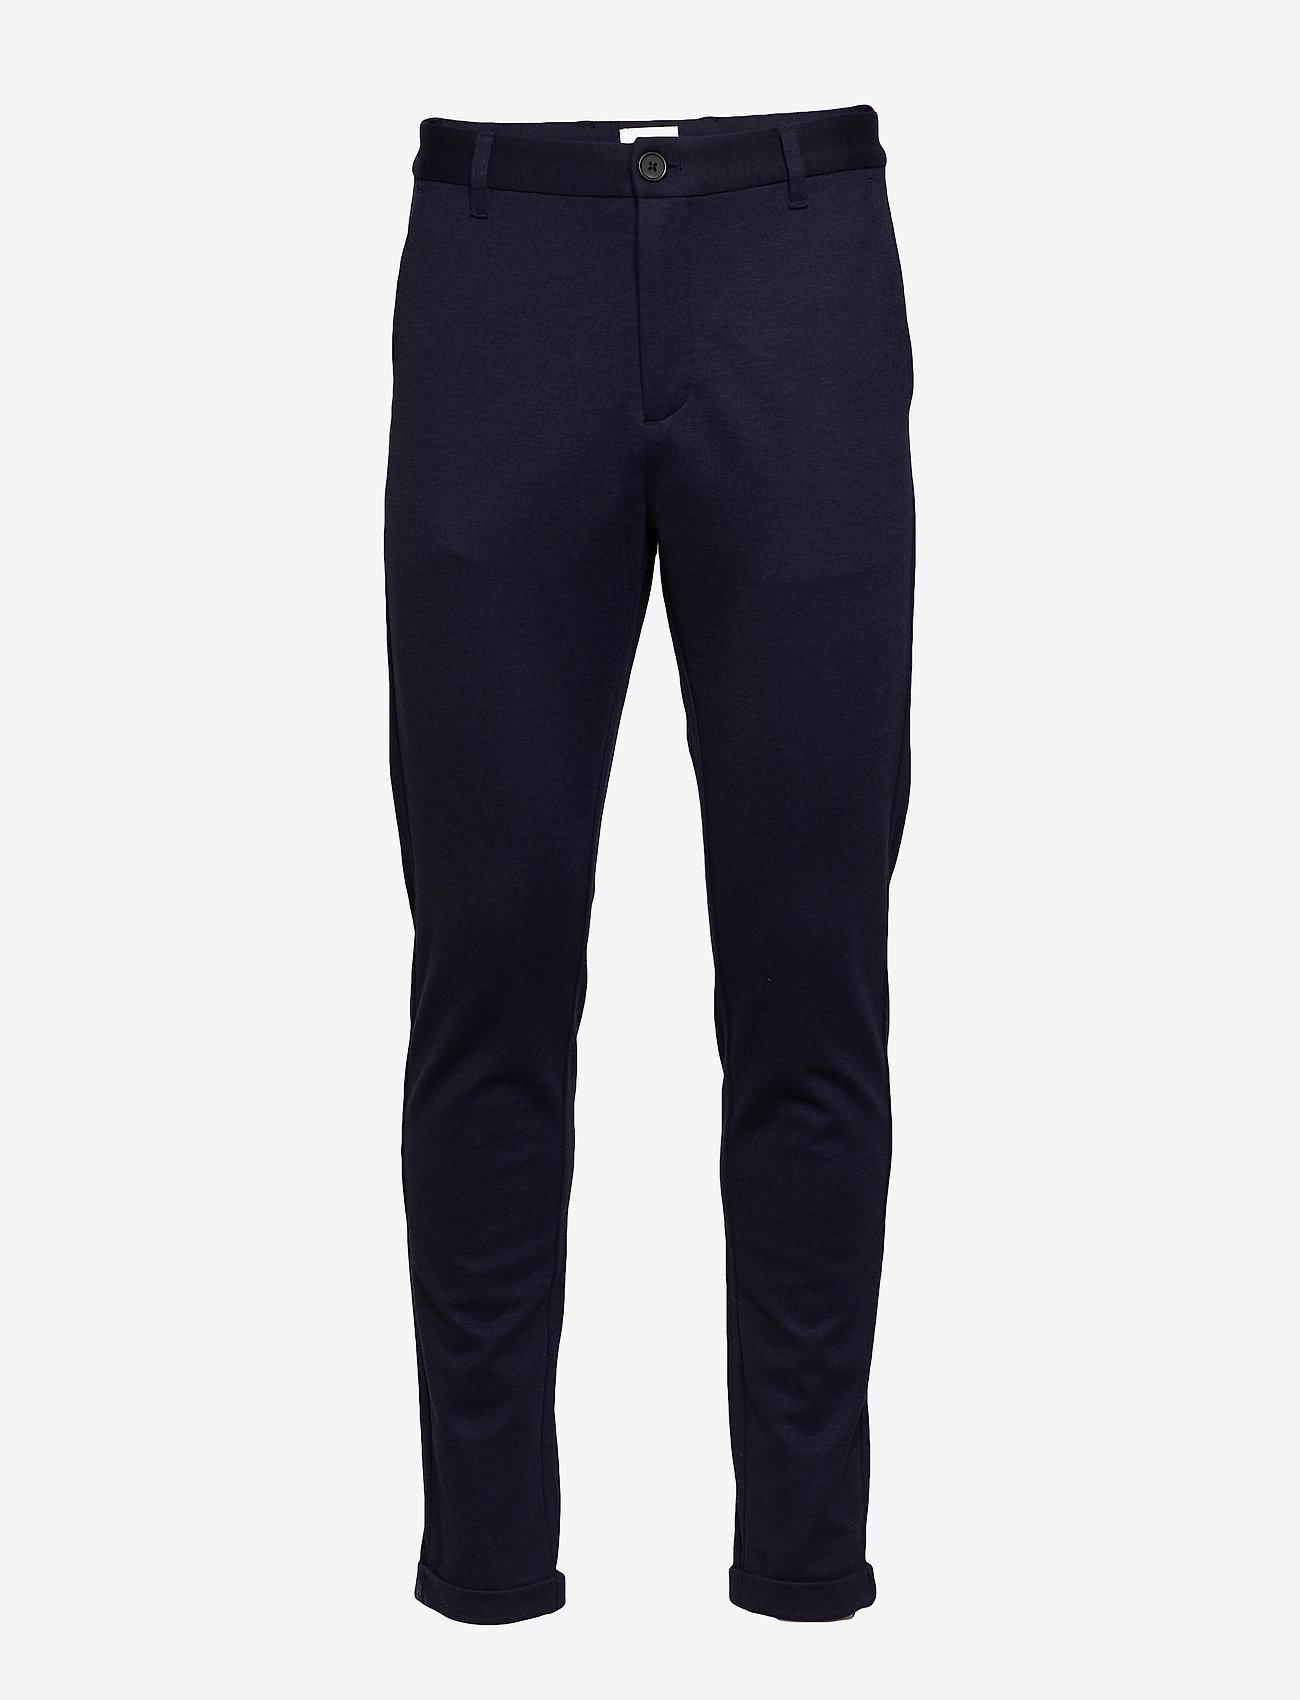 Lindbergh - Knitted pants normal length - spodnie na co dzień - navy mix - 1